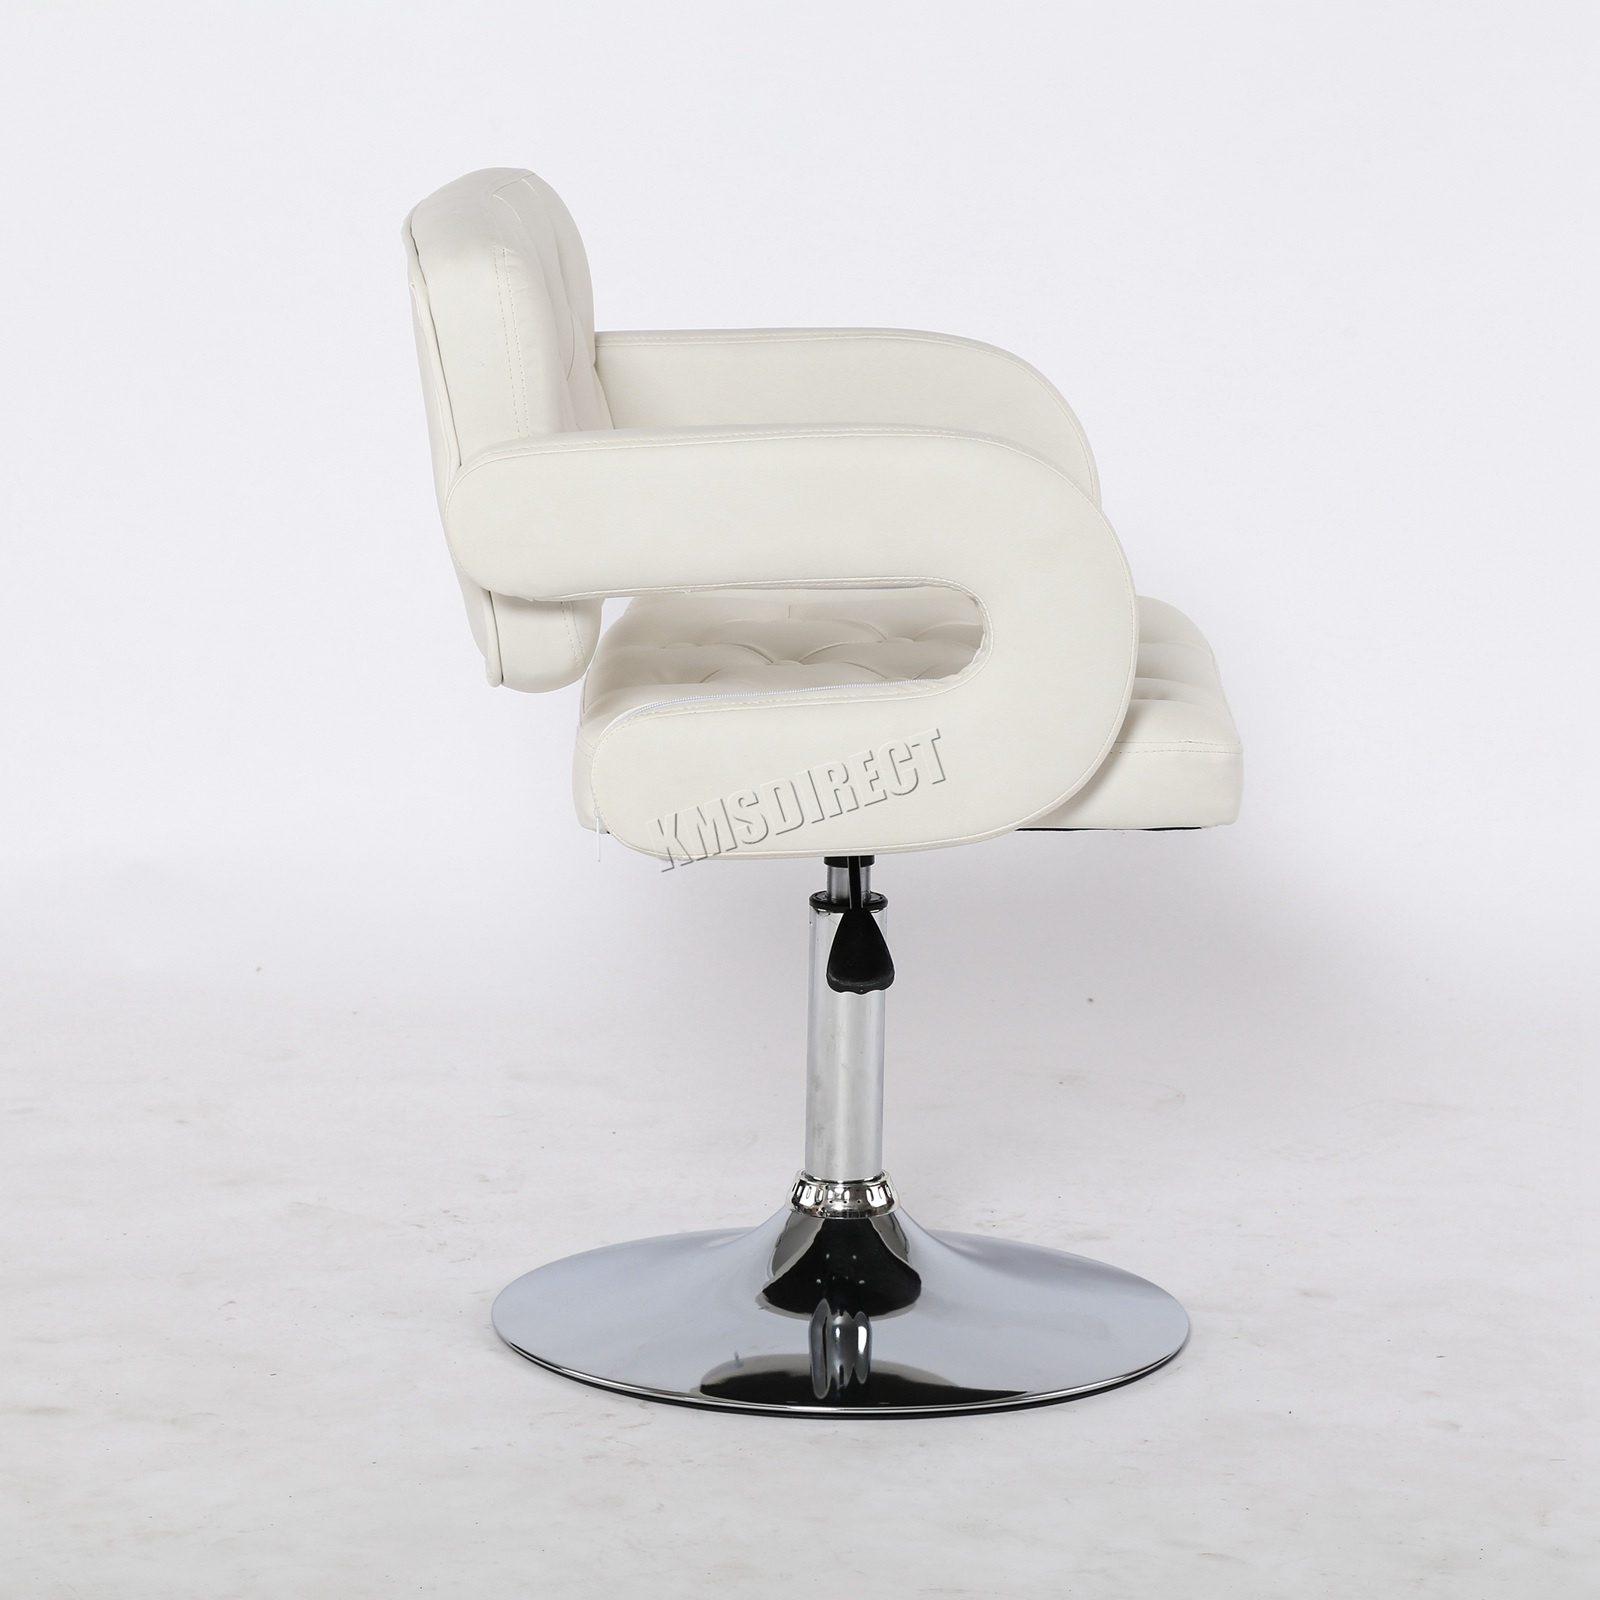 WestWood-Beauty-Salon-Chair-Barber-Hairdressing-Hair-Cut-PU-Leather-Modern-SC02 miniatuur 25